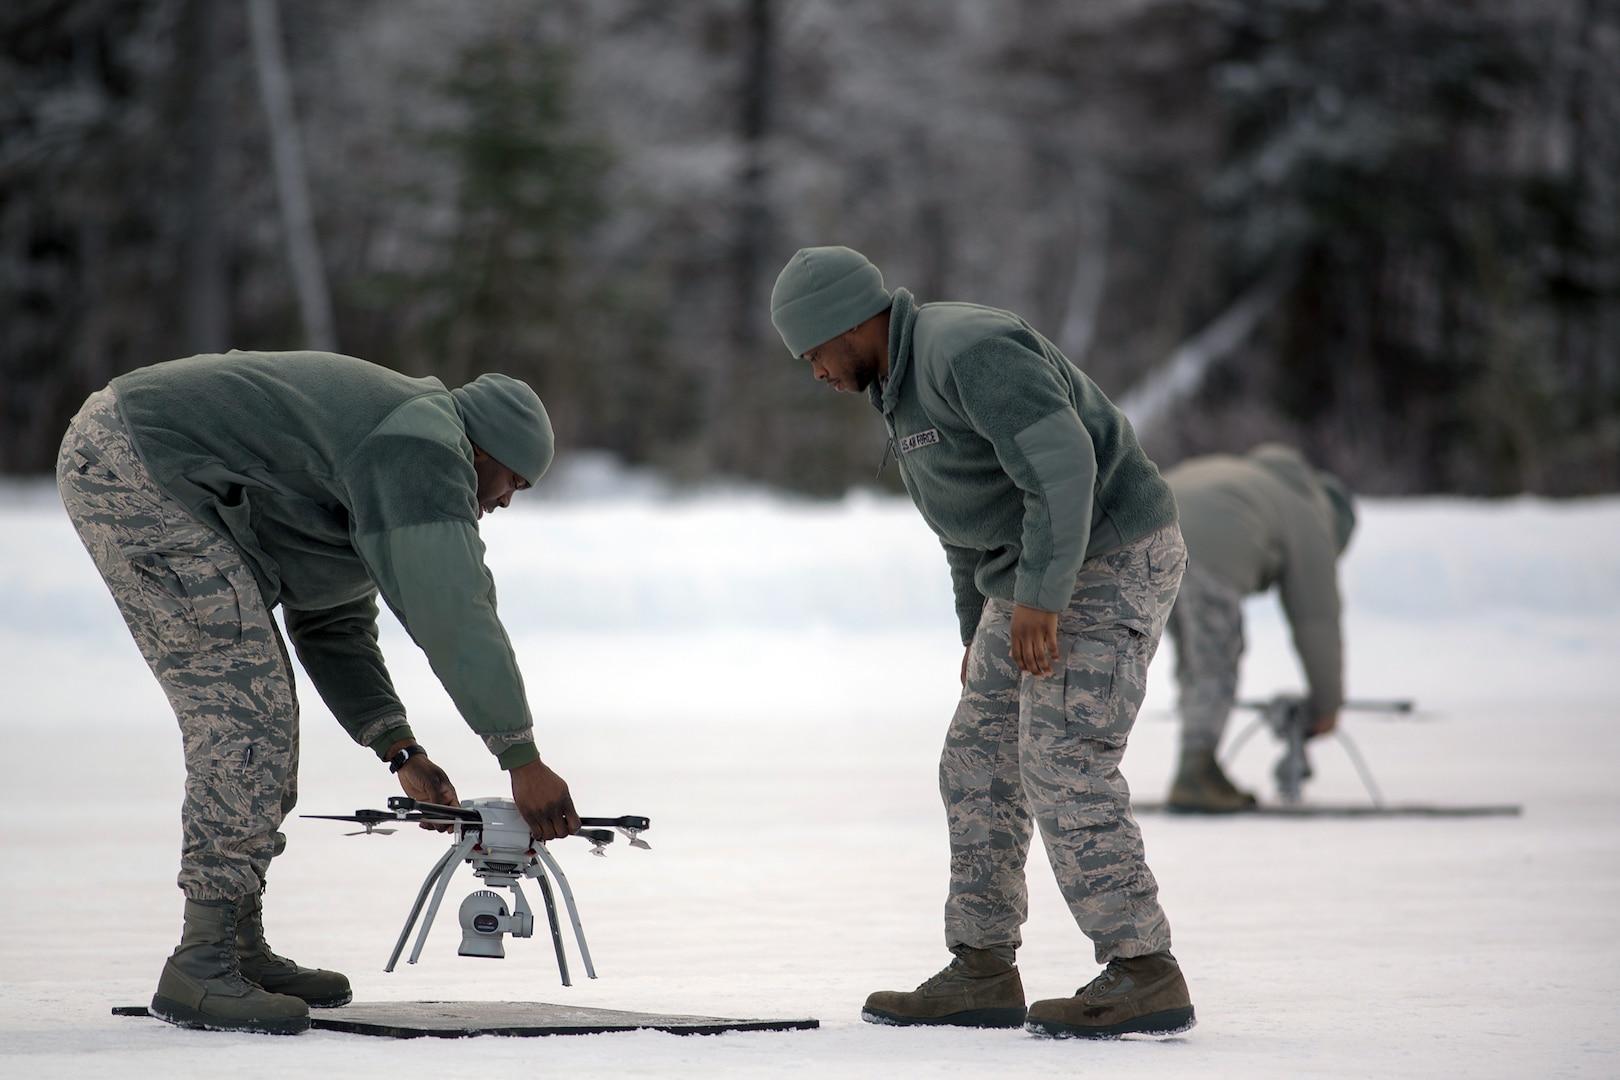 PACAF Cultivates Civil Engineer Airmen with Ground-breaking RADAS Training